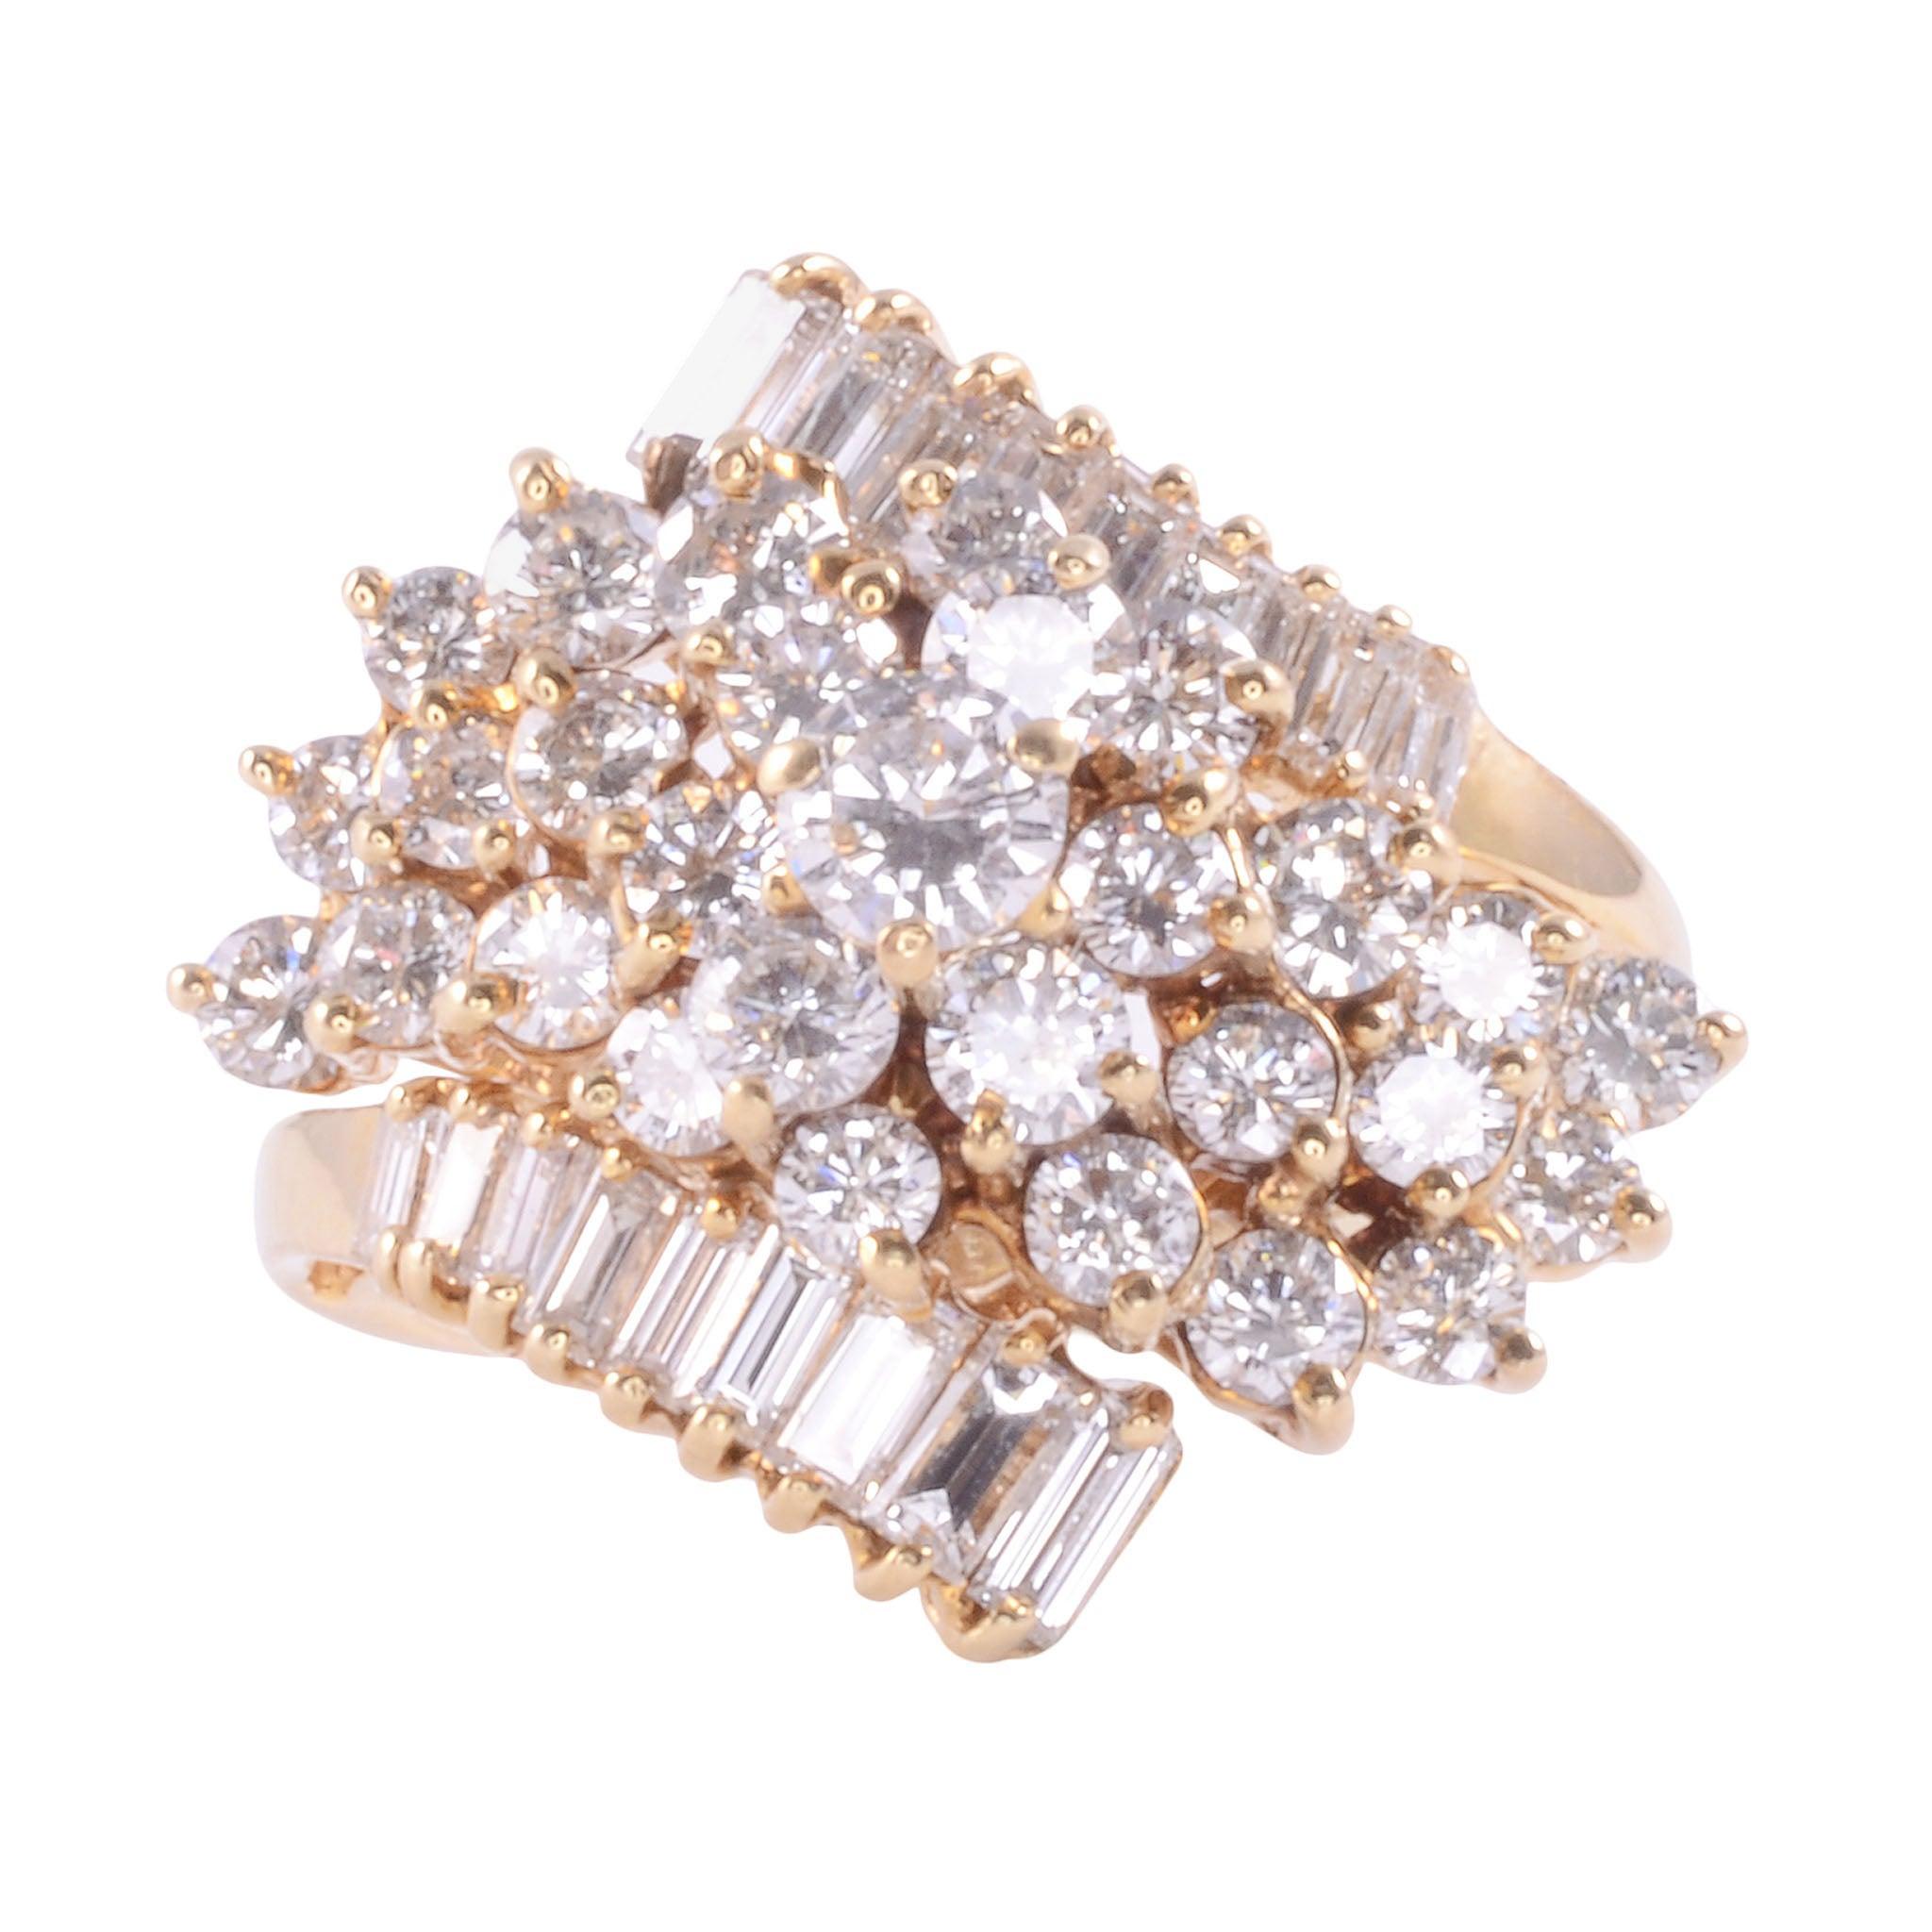 2.50 CTW VVS1-VS1 Diamond Cluster Ring